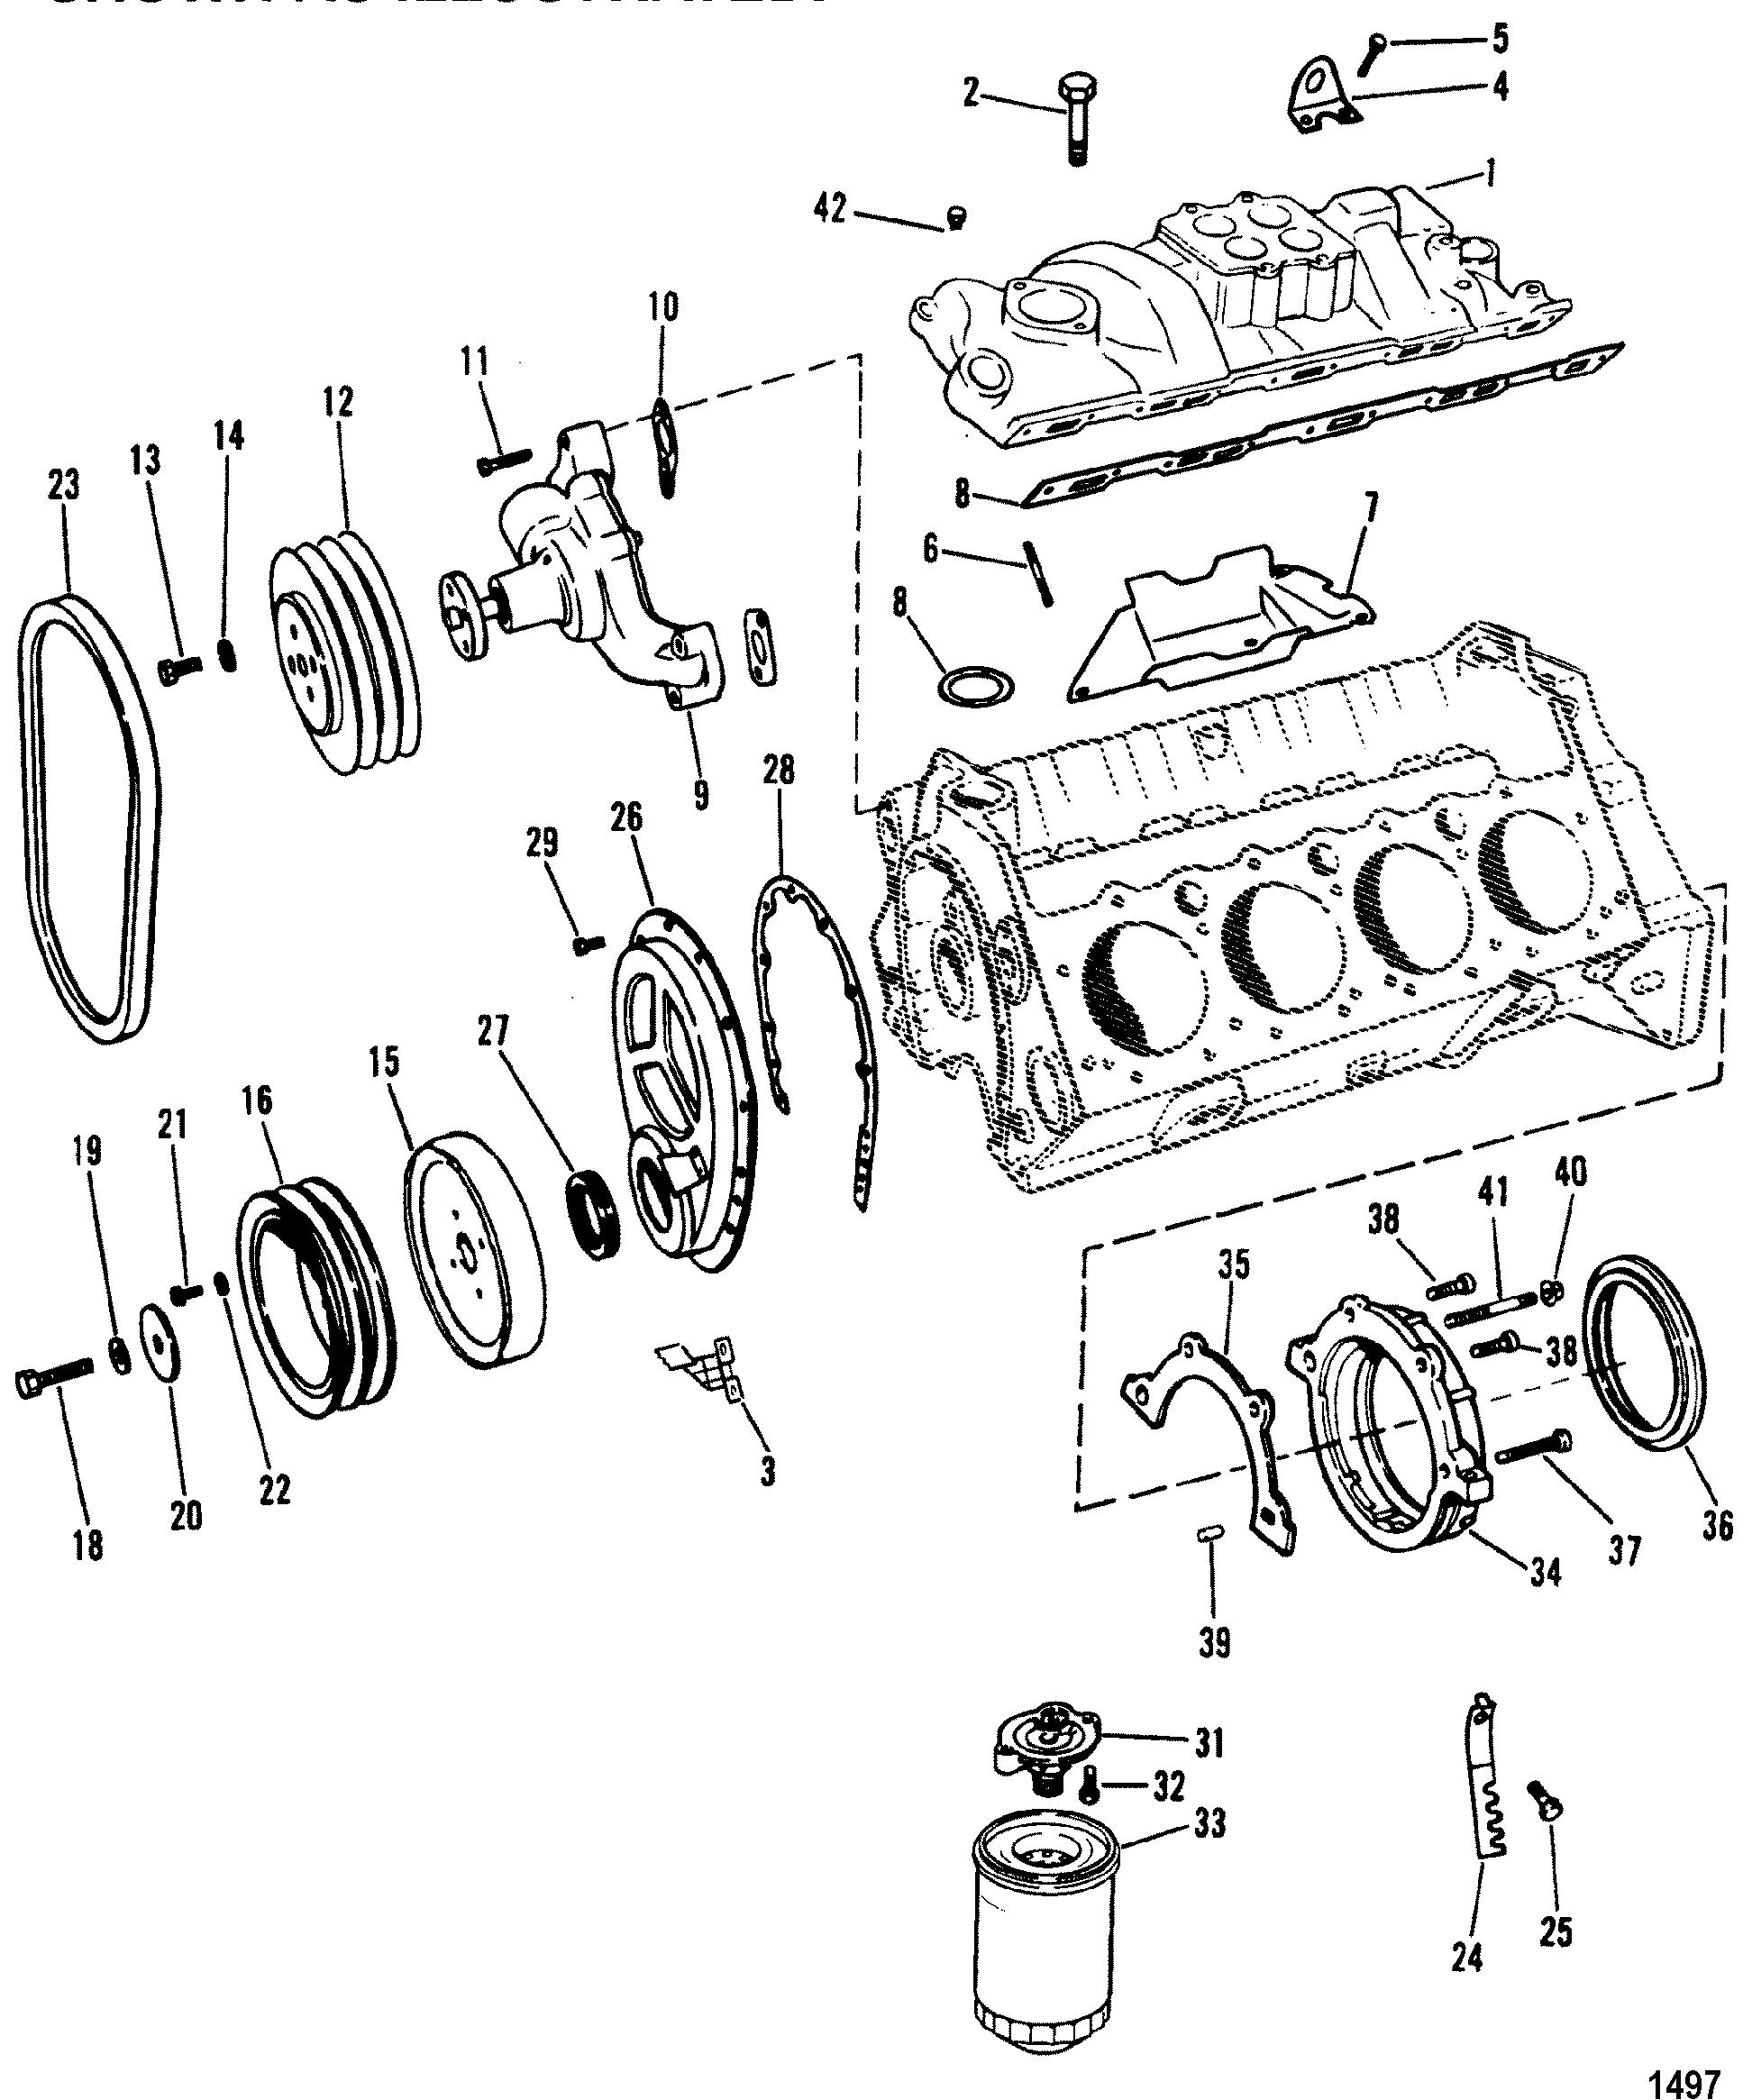 hardin marine intake manifold and front cover design i 2001 Chevy Tracker 5 7l gm 350 v 8 1988 1995 serial 0b525982 thru 0f600999 intake manifold and front cover design i